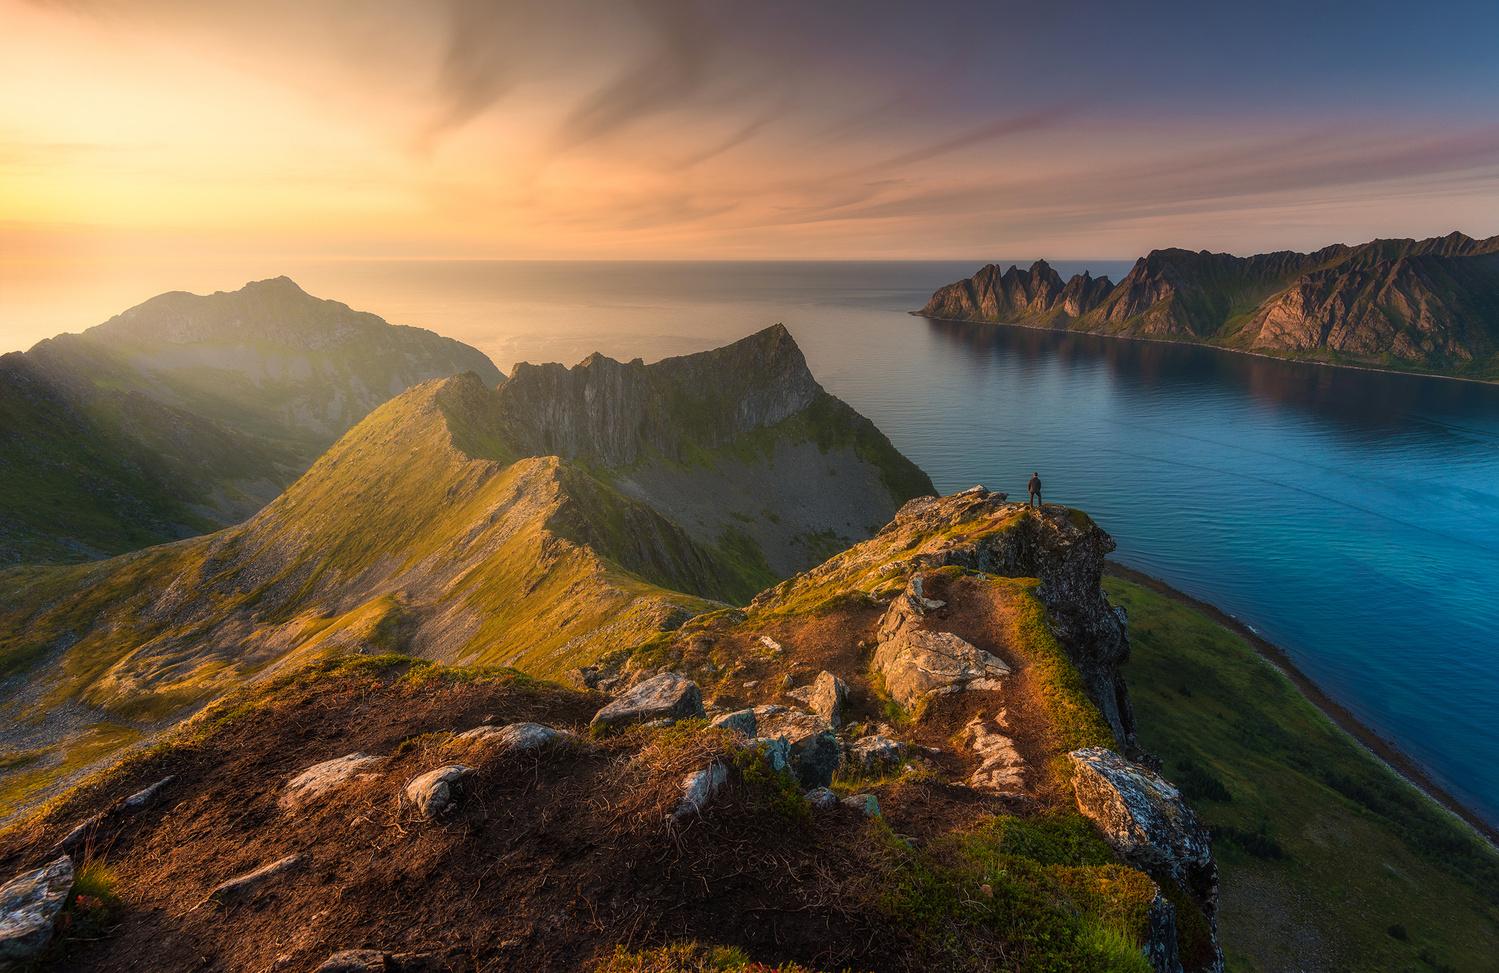 Husfjellet by Philip Slotte